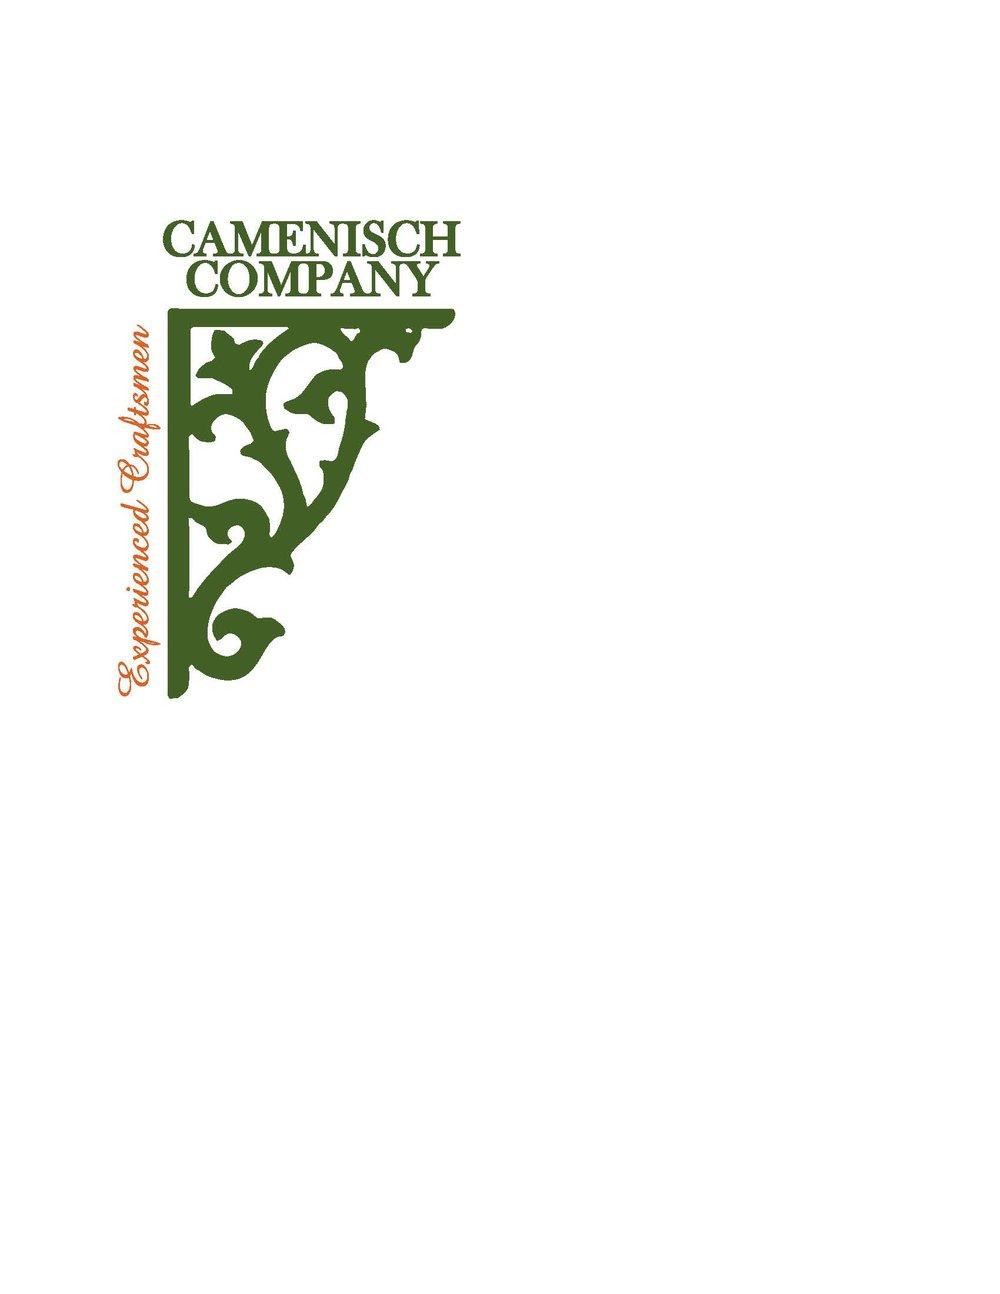 Camenisch Company